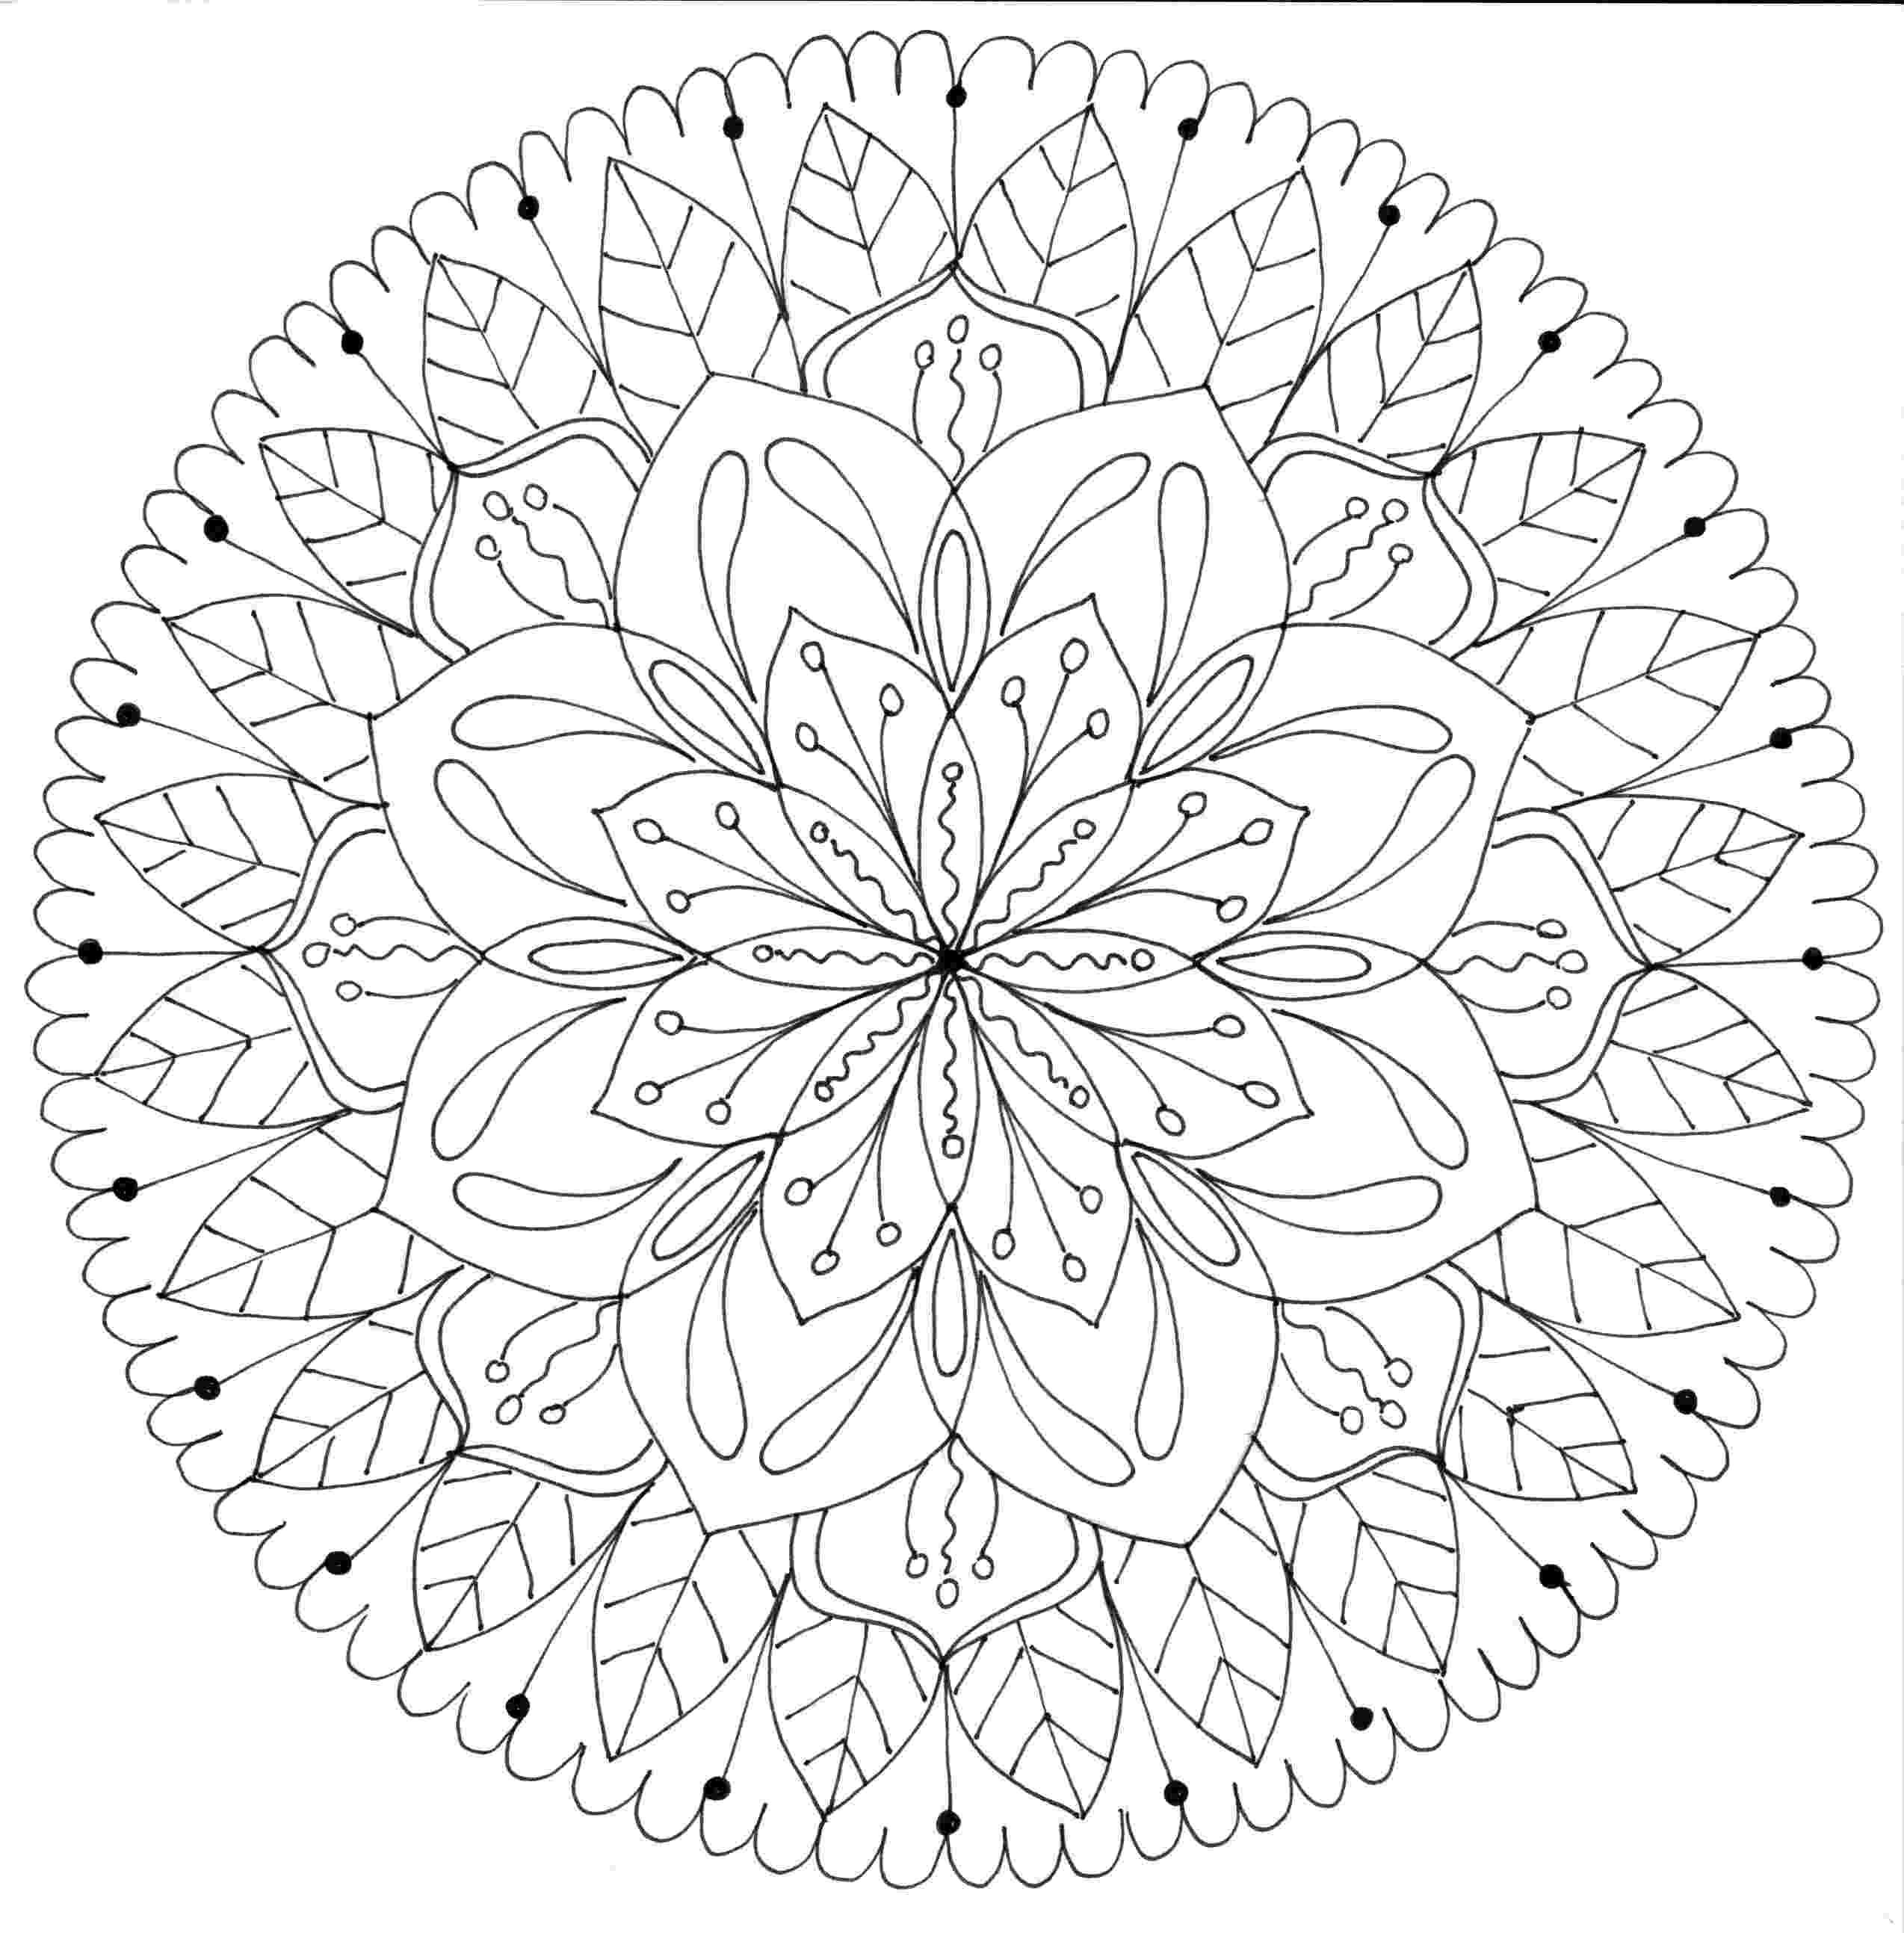 mandala color coloring to calm volume one mandalas color mandala